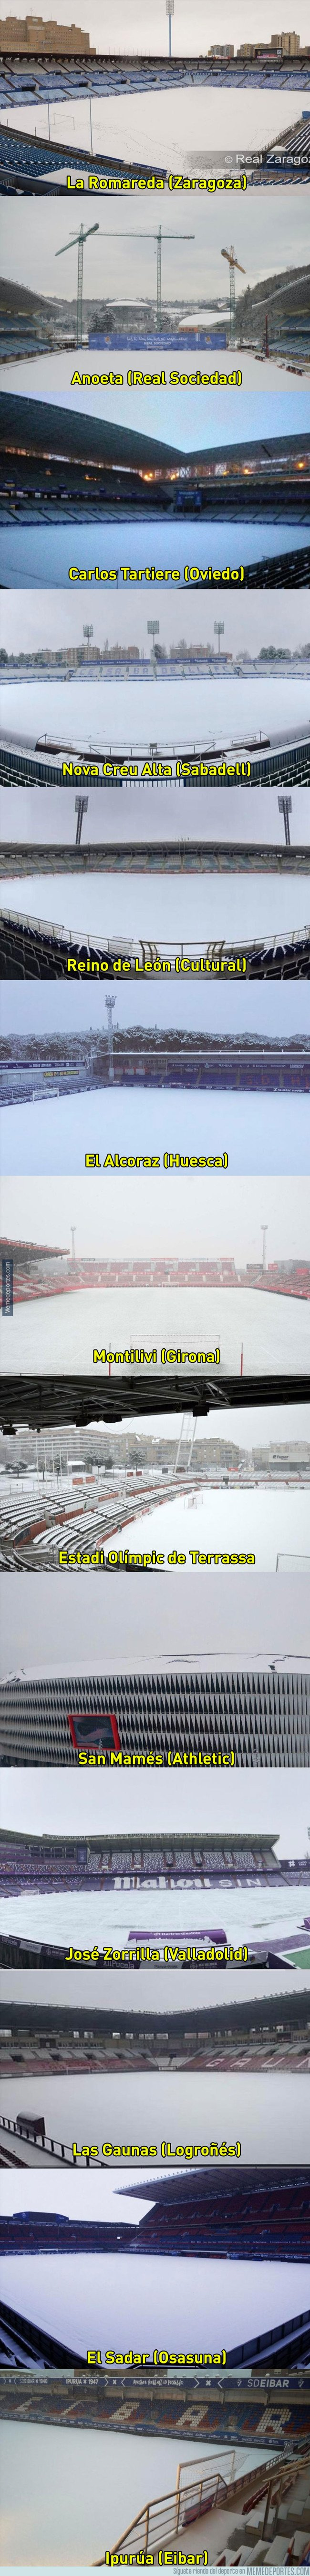 1023725 - Así han amanecido estos campos de fútbol en España esta mañana